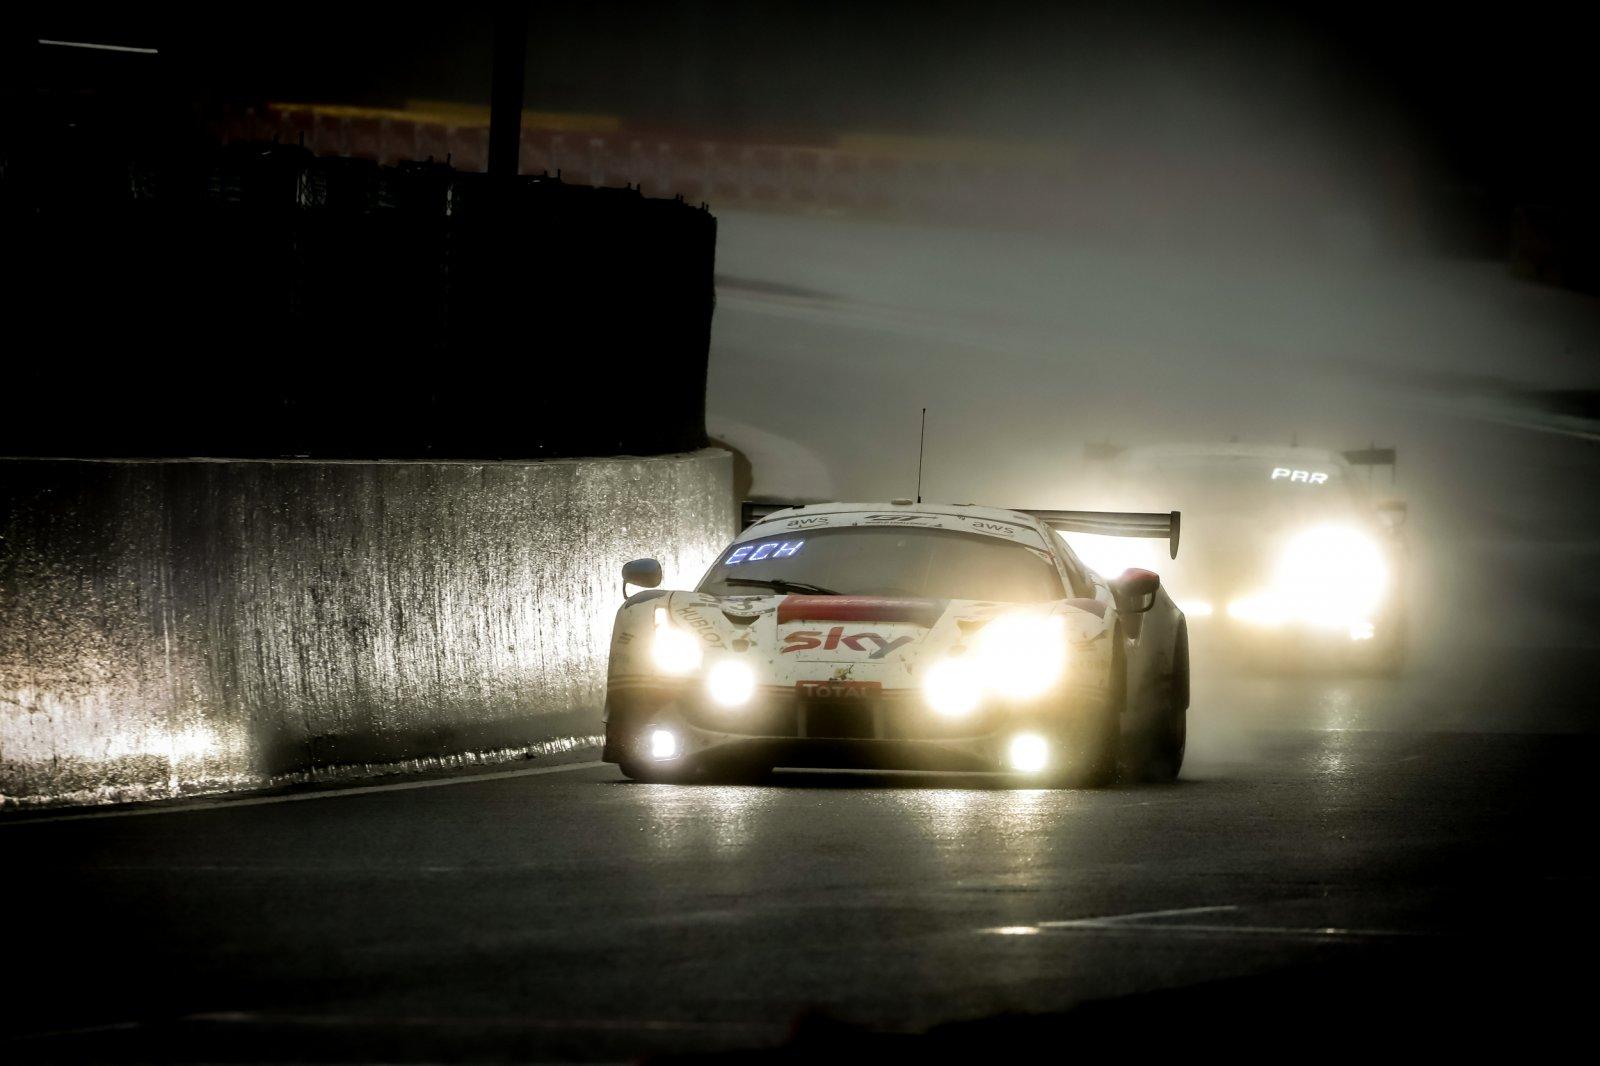 #93 SKYTempesta Racing GBR Jonathan Hui HKG Chris Froggatt GBR Eddie Cheever ITA Giancarlo Fisichella ITA IGTC, Race